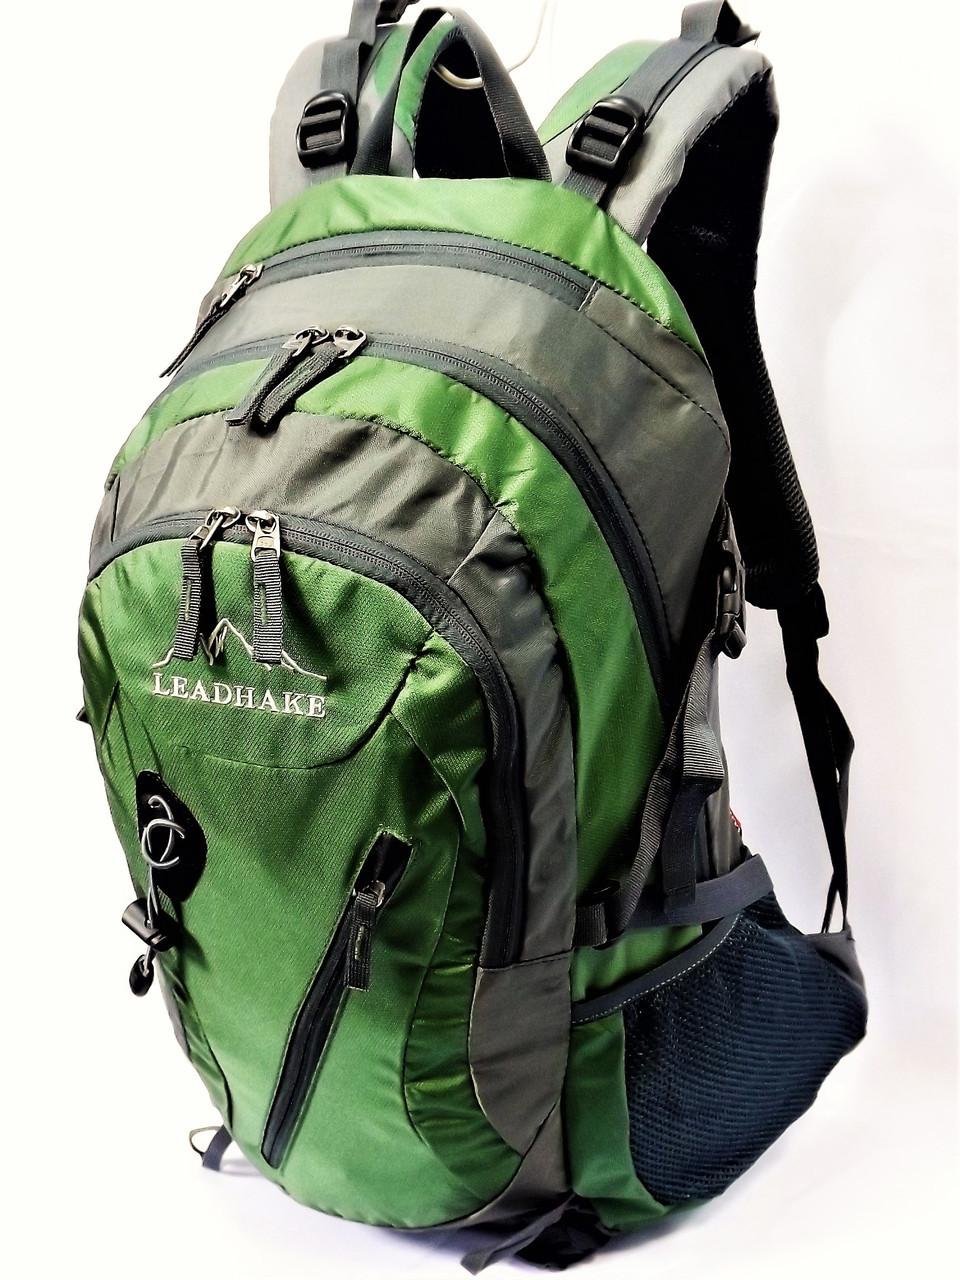 Рюкзак туристический  Leadhake S1004  (38 литров) зеленый